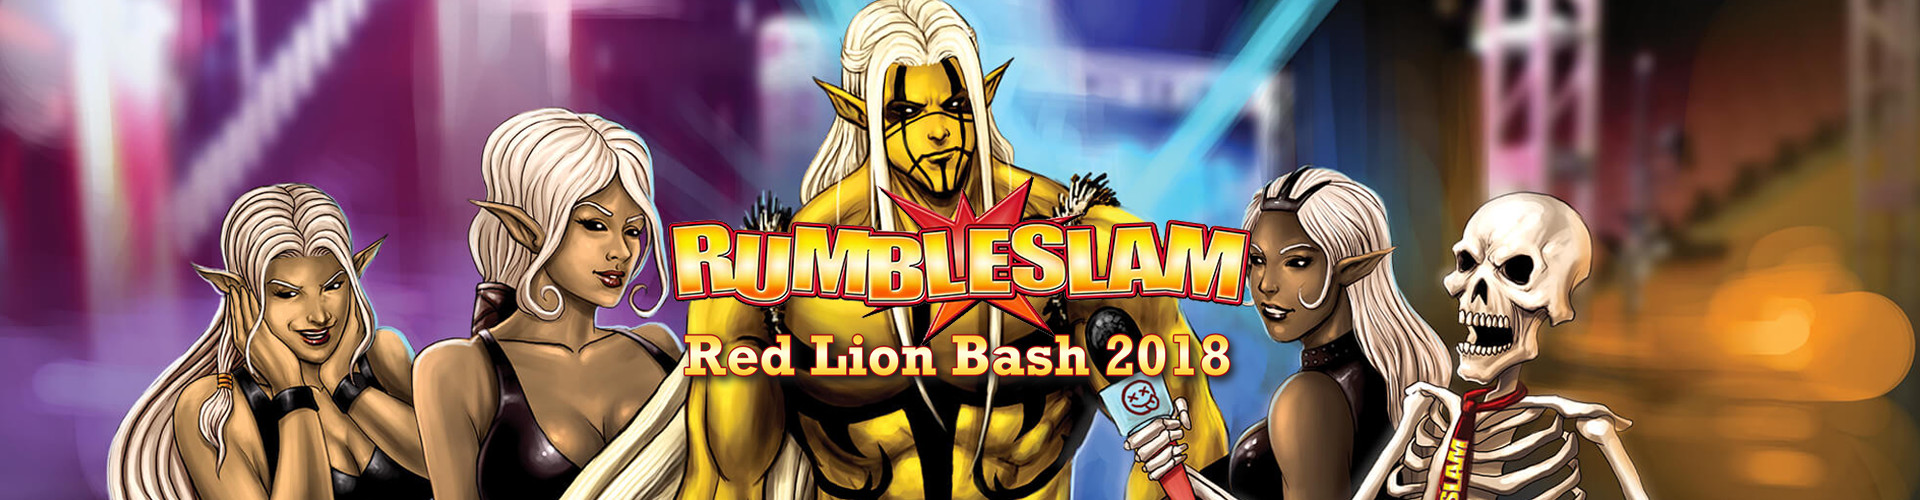 TNM 03 Rumbleslam - Turnier: RUMBLESLAM